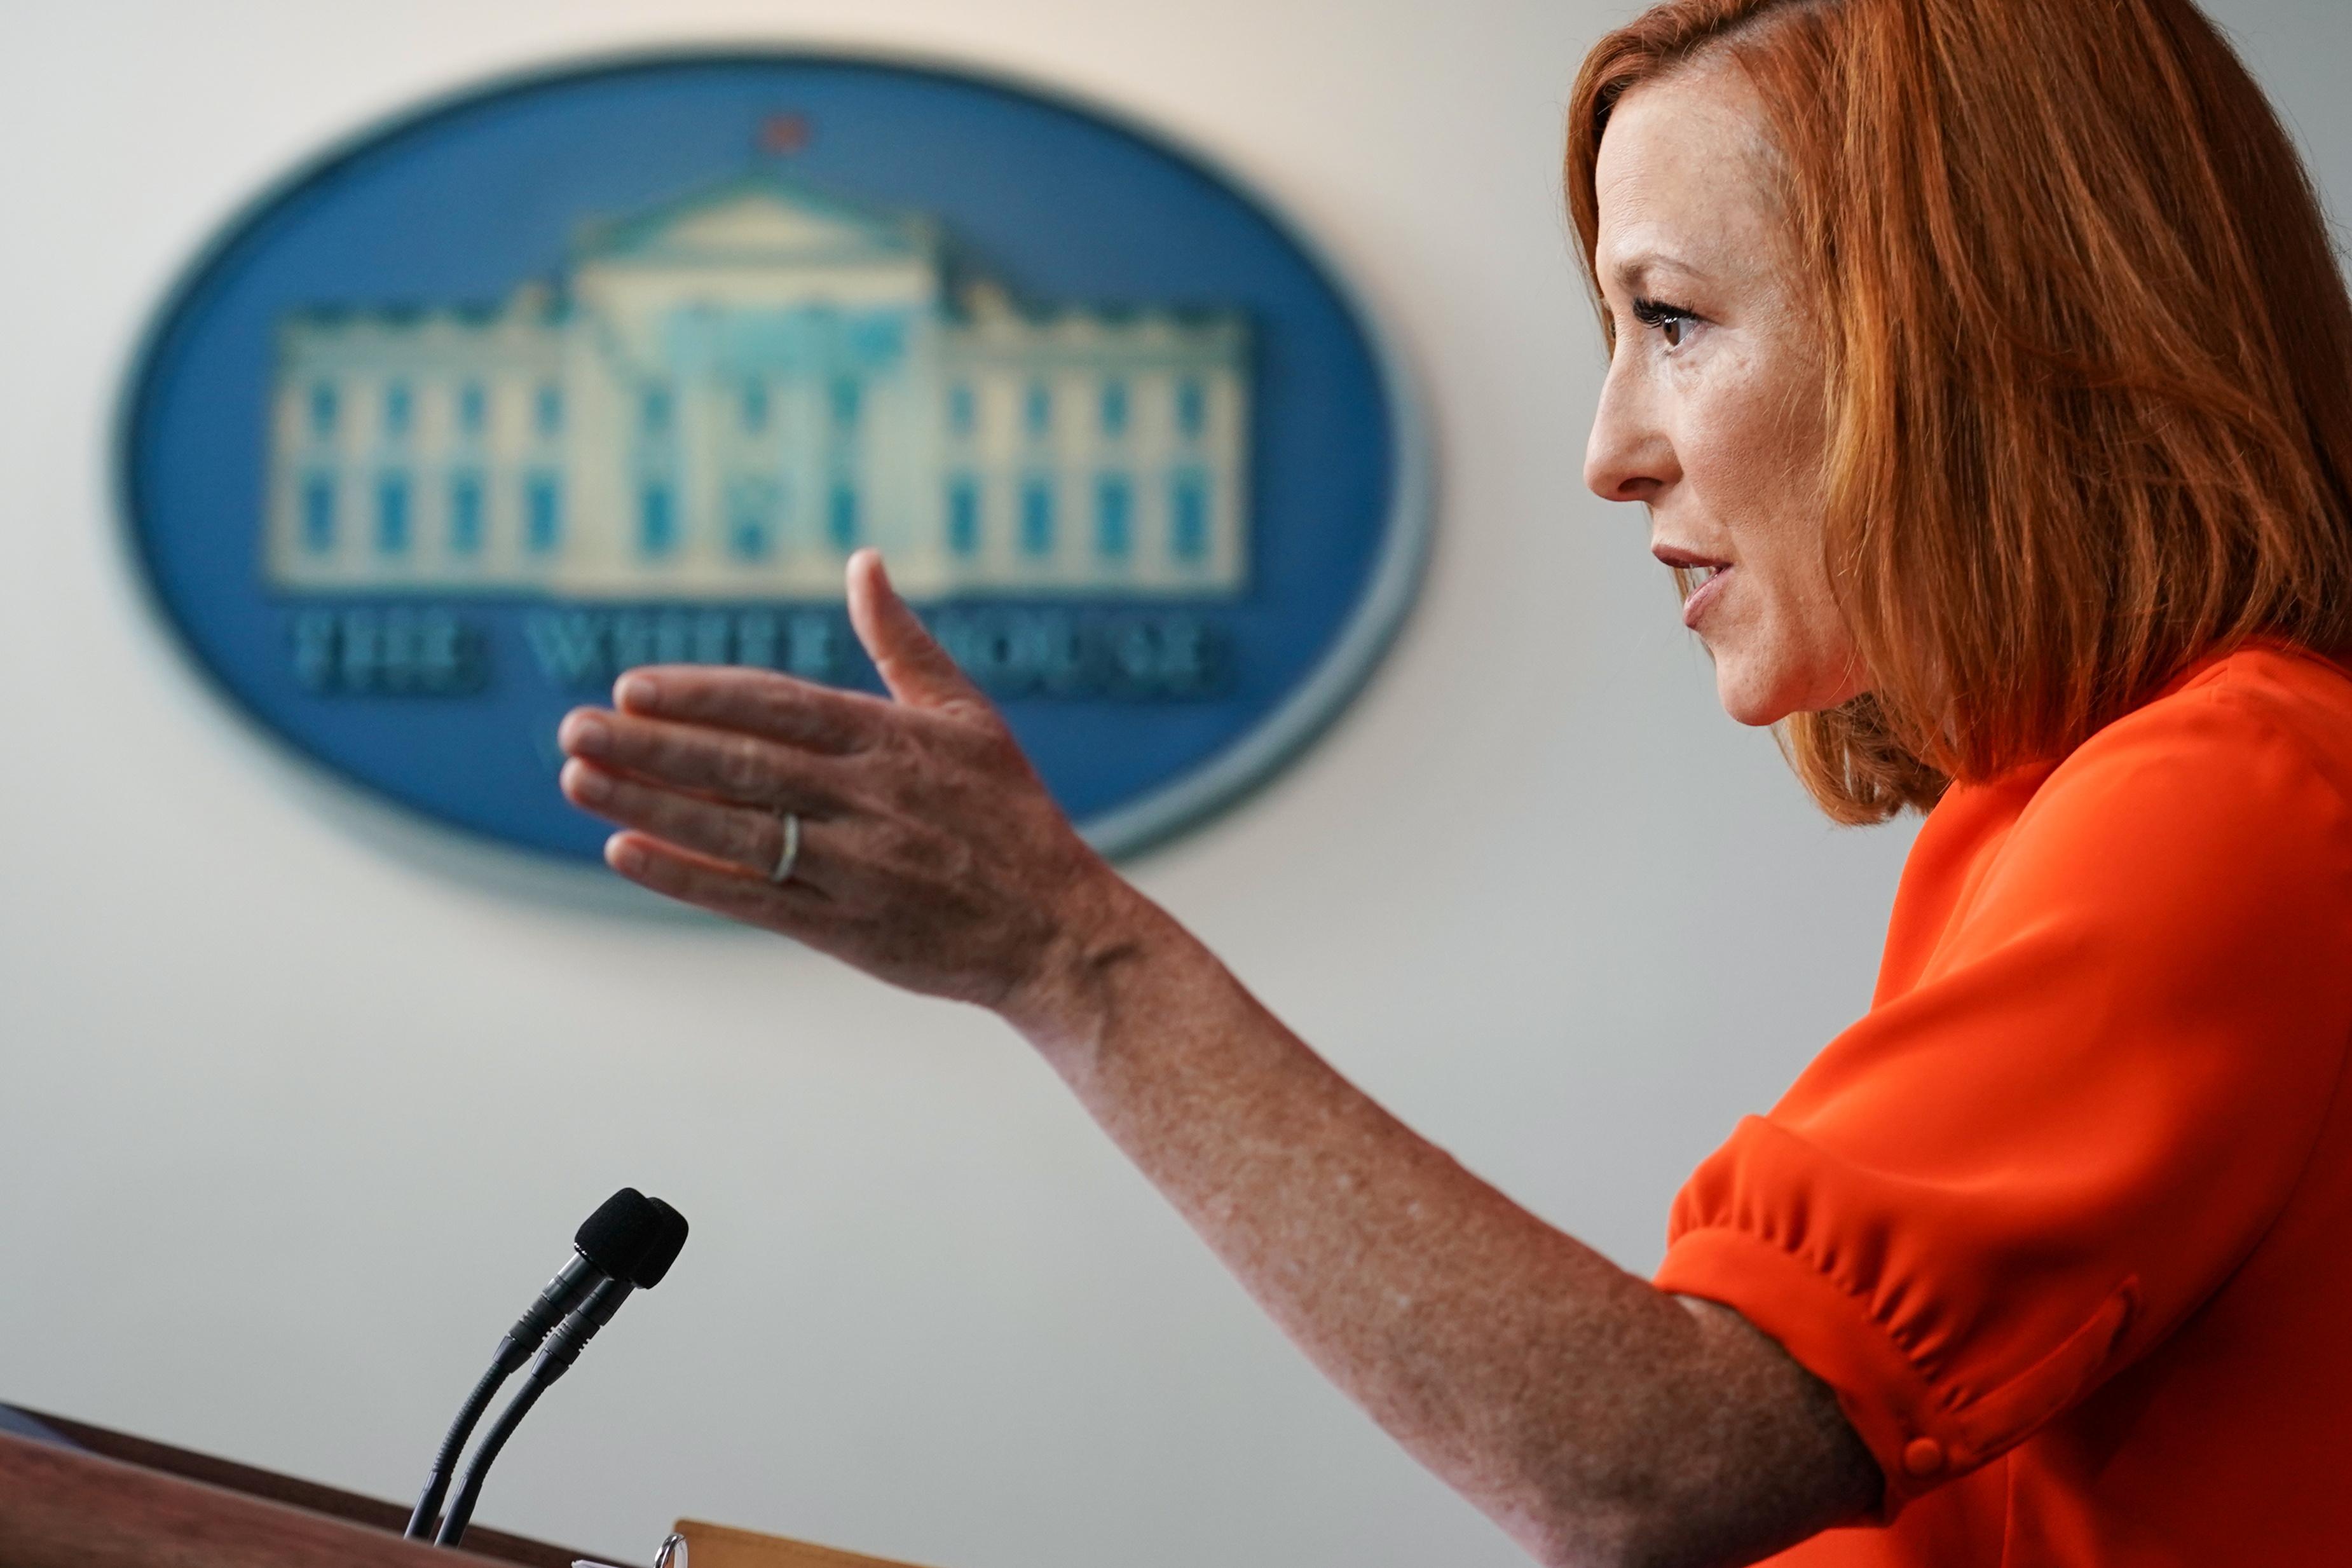 White House Press Secretary Jen Psaki holds a press briefing at the White House in Washington, U.S., June 21, 2021. REUTERS/Sarah Silbiger